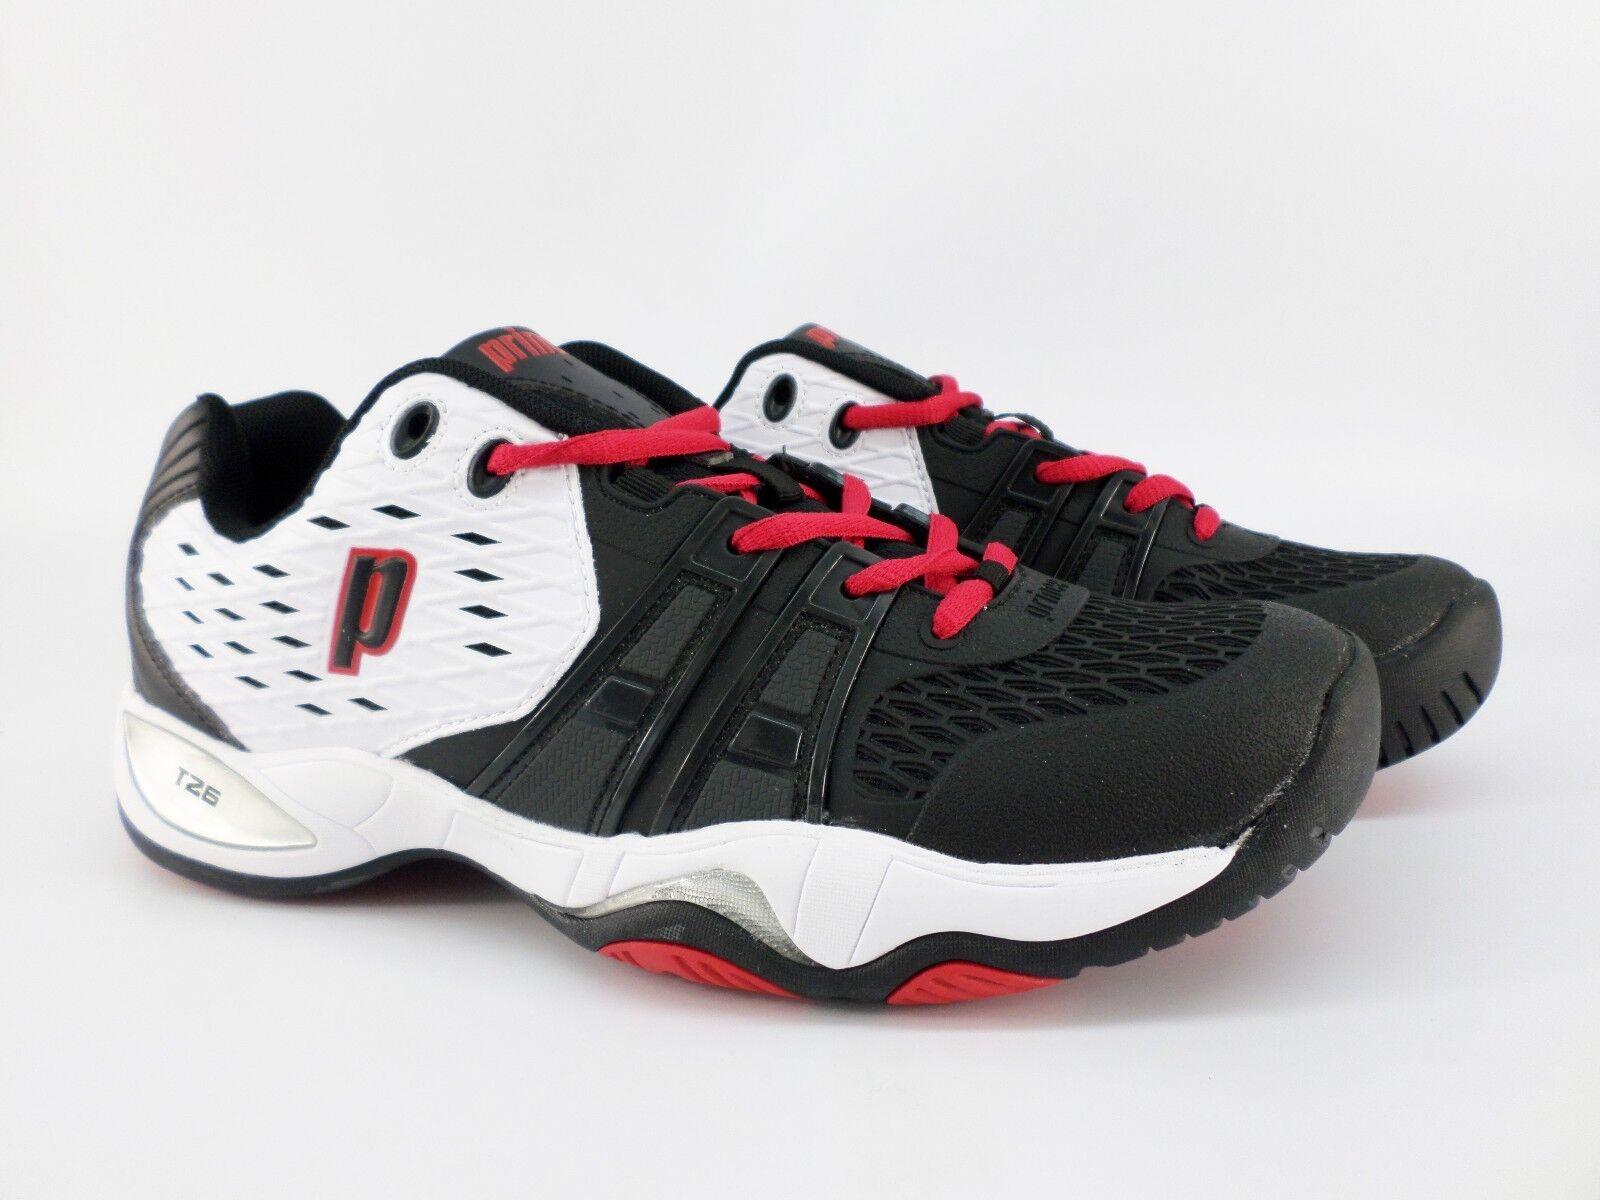 new styles fad49 86bf9 PRINCE T25 Men Men Men Tennis Shoes US 7 - 11 100% Authentic New 8P021043